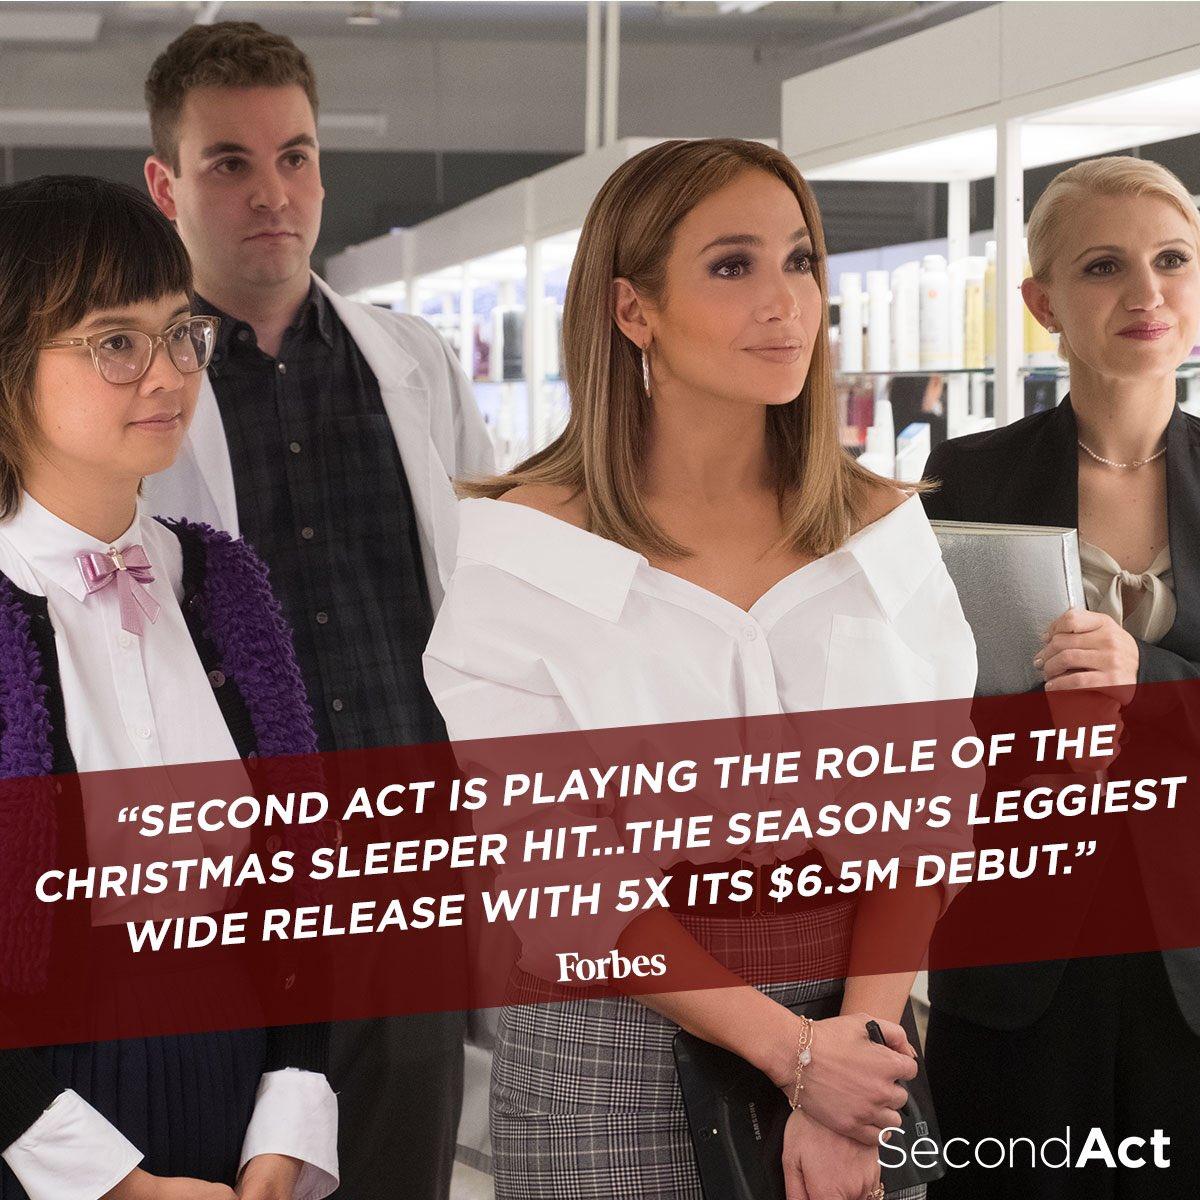 #SecondAct�������������������� https://t.co/nPqn84kf4z